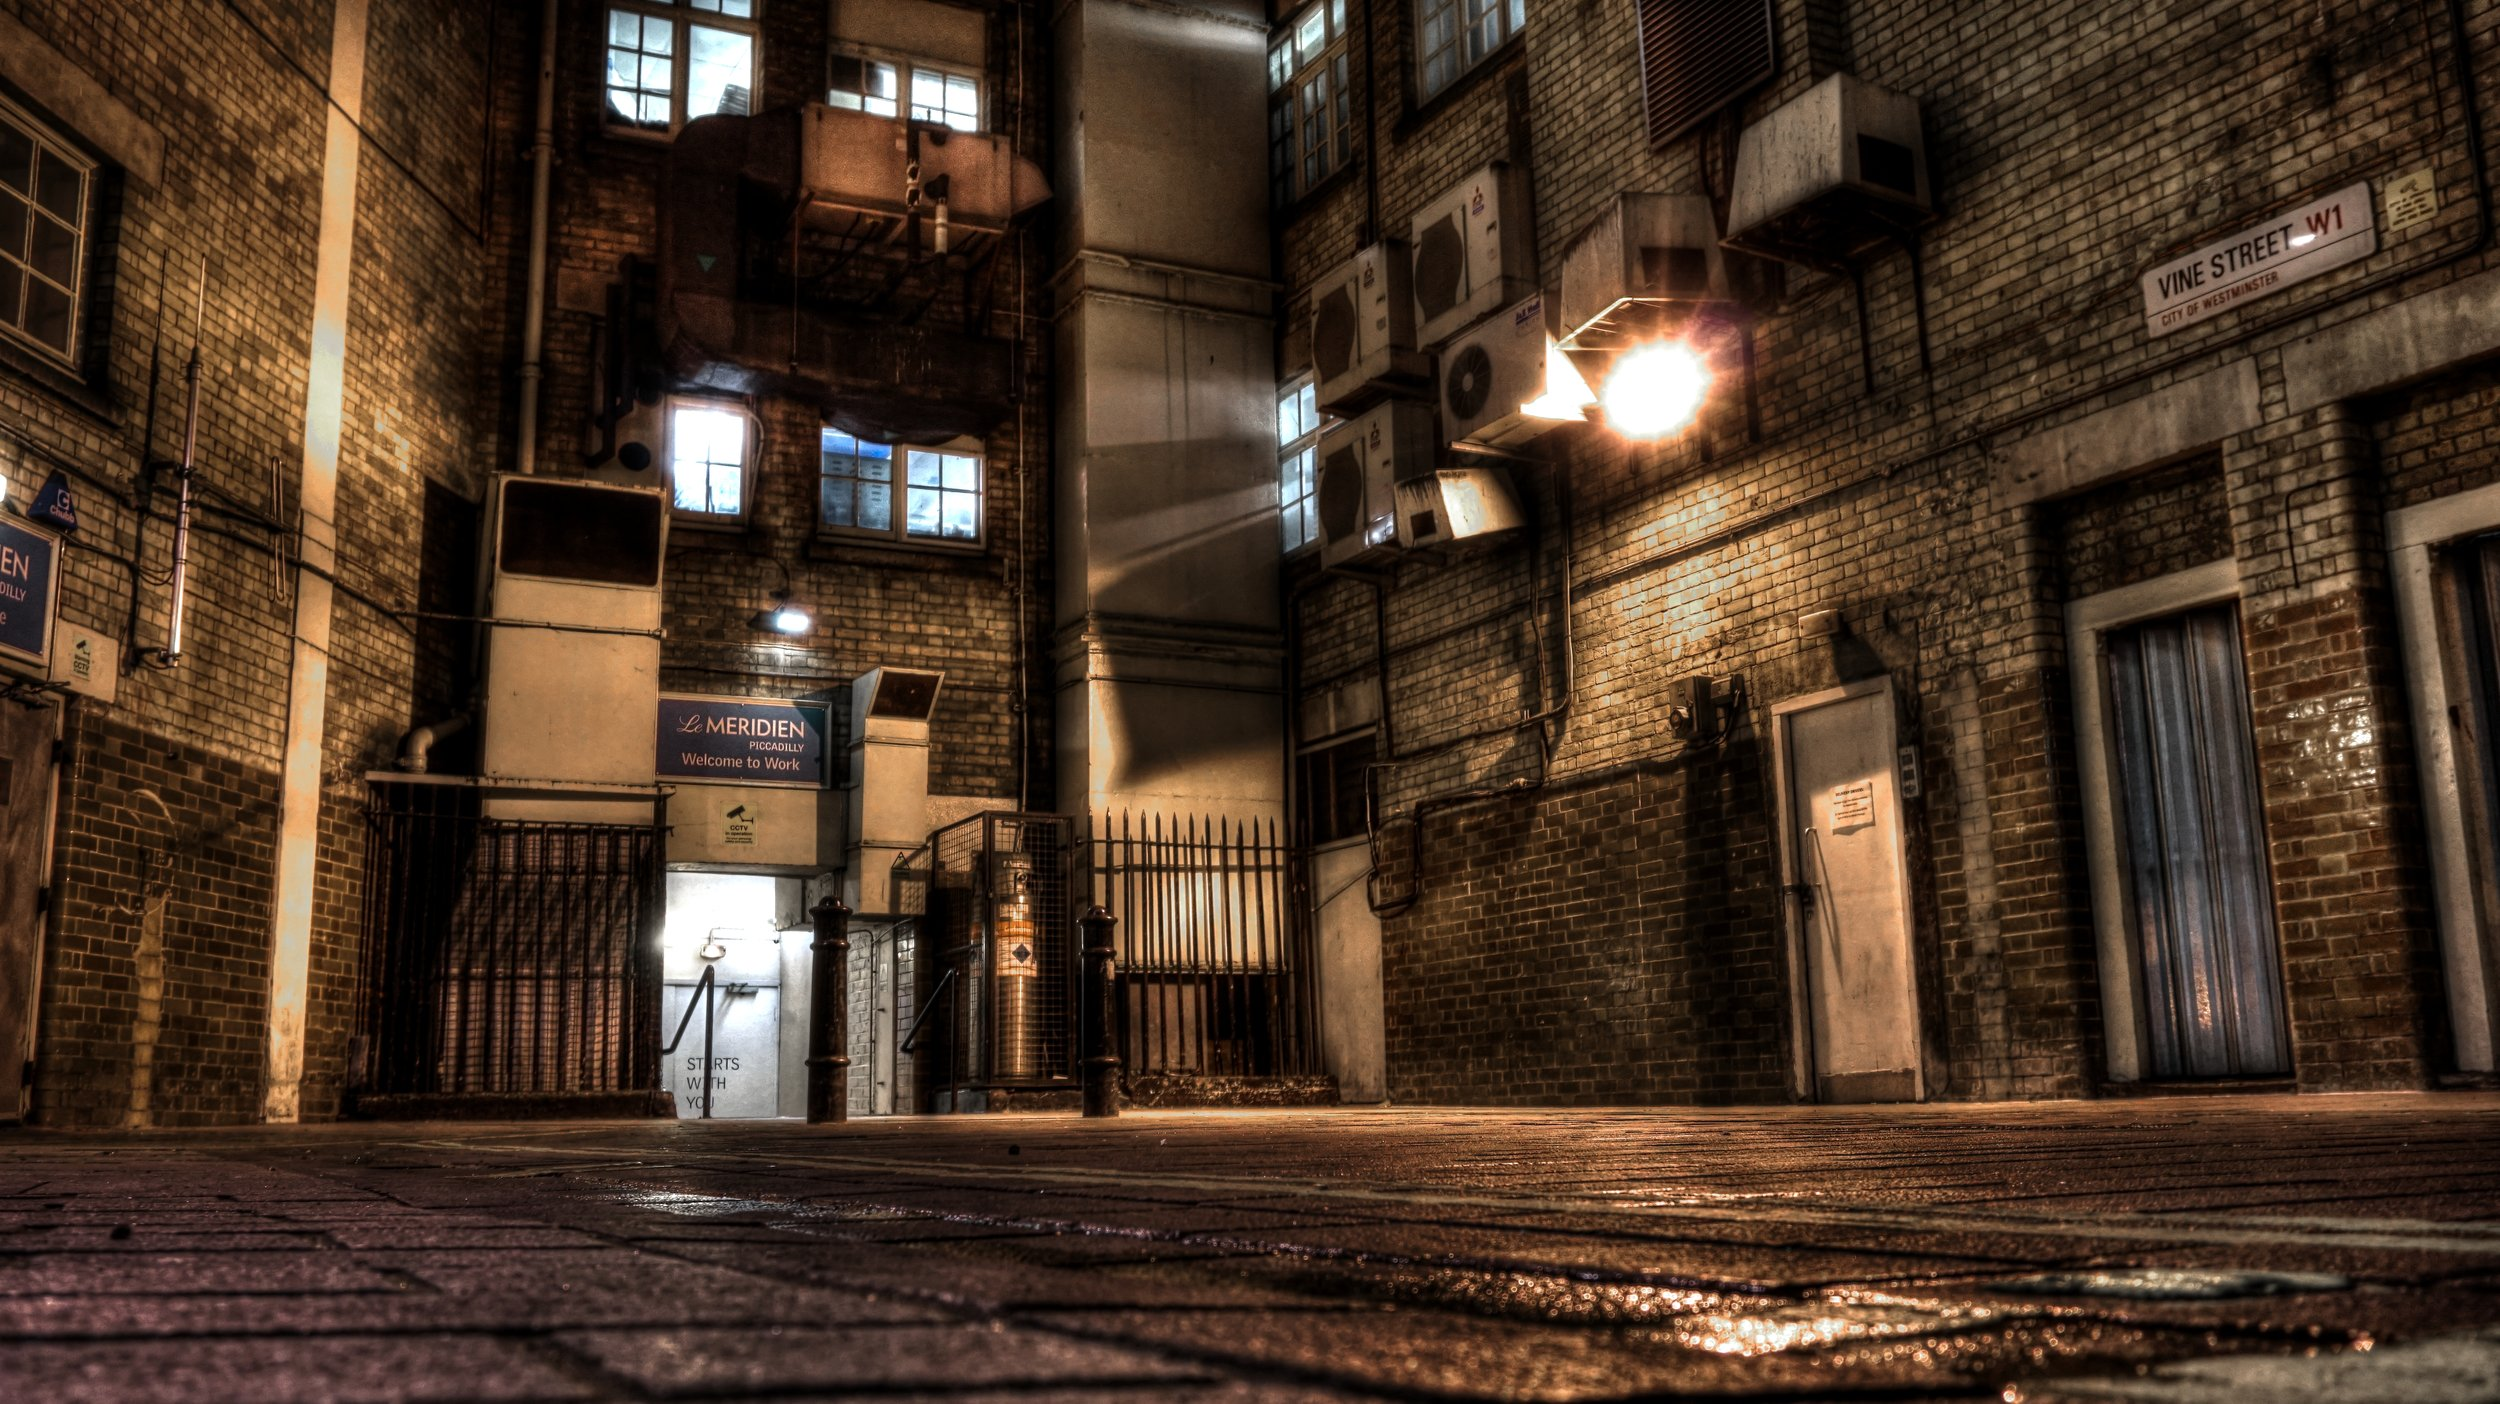 london5vinestreet.jpg